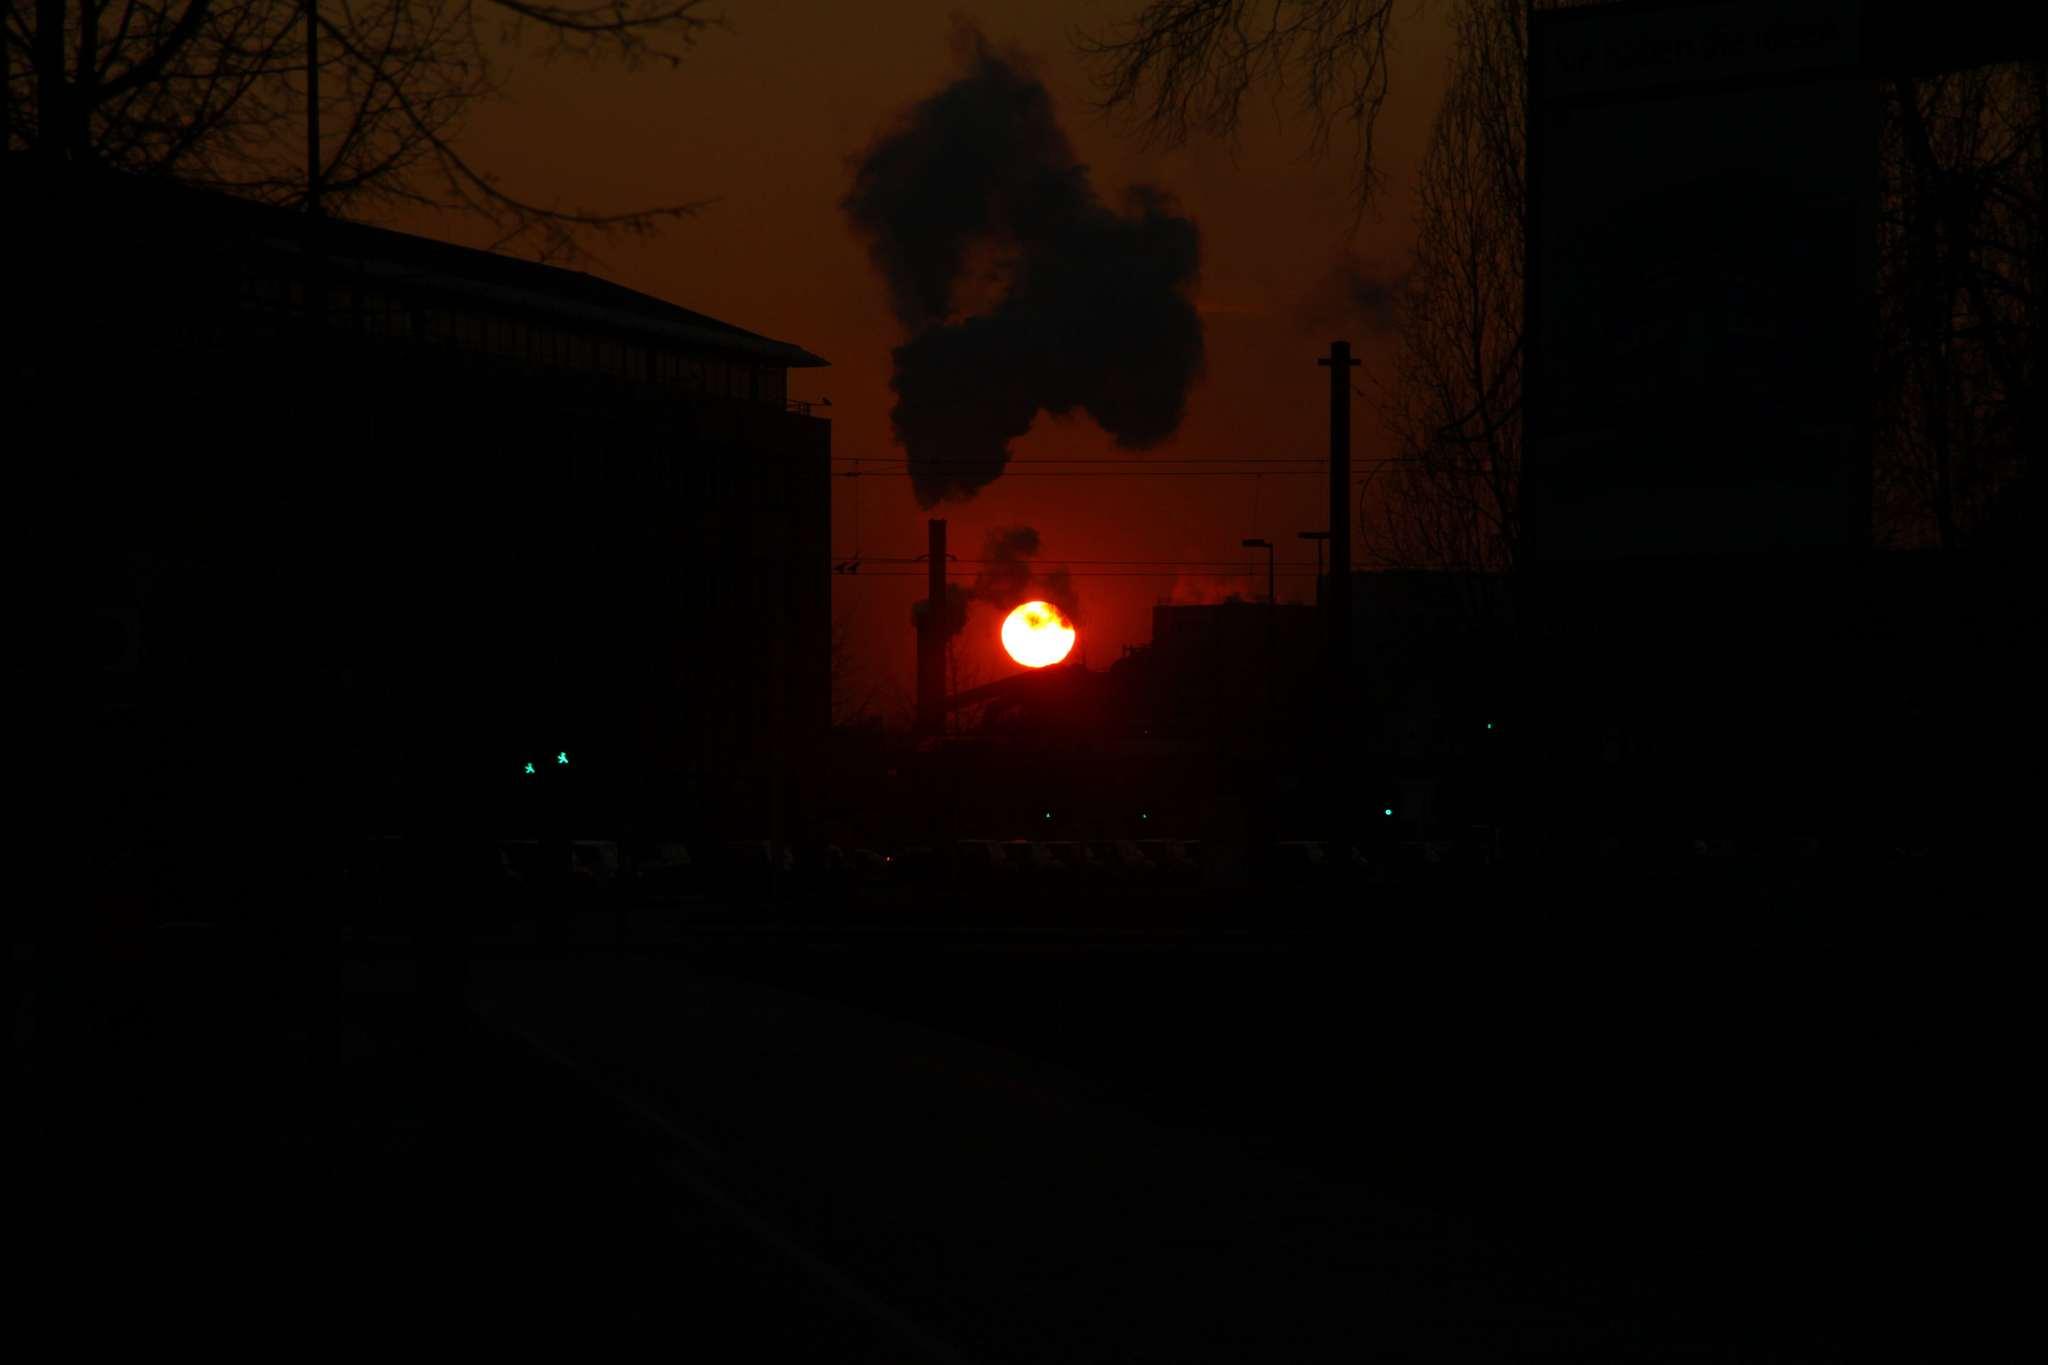 As the sun sets